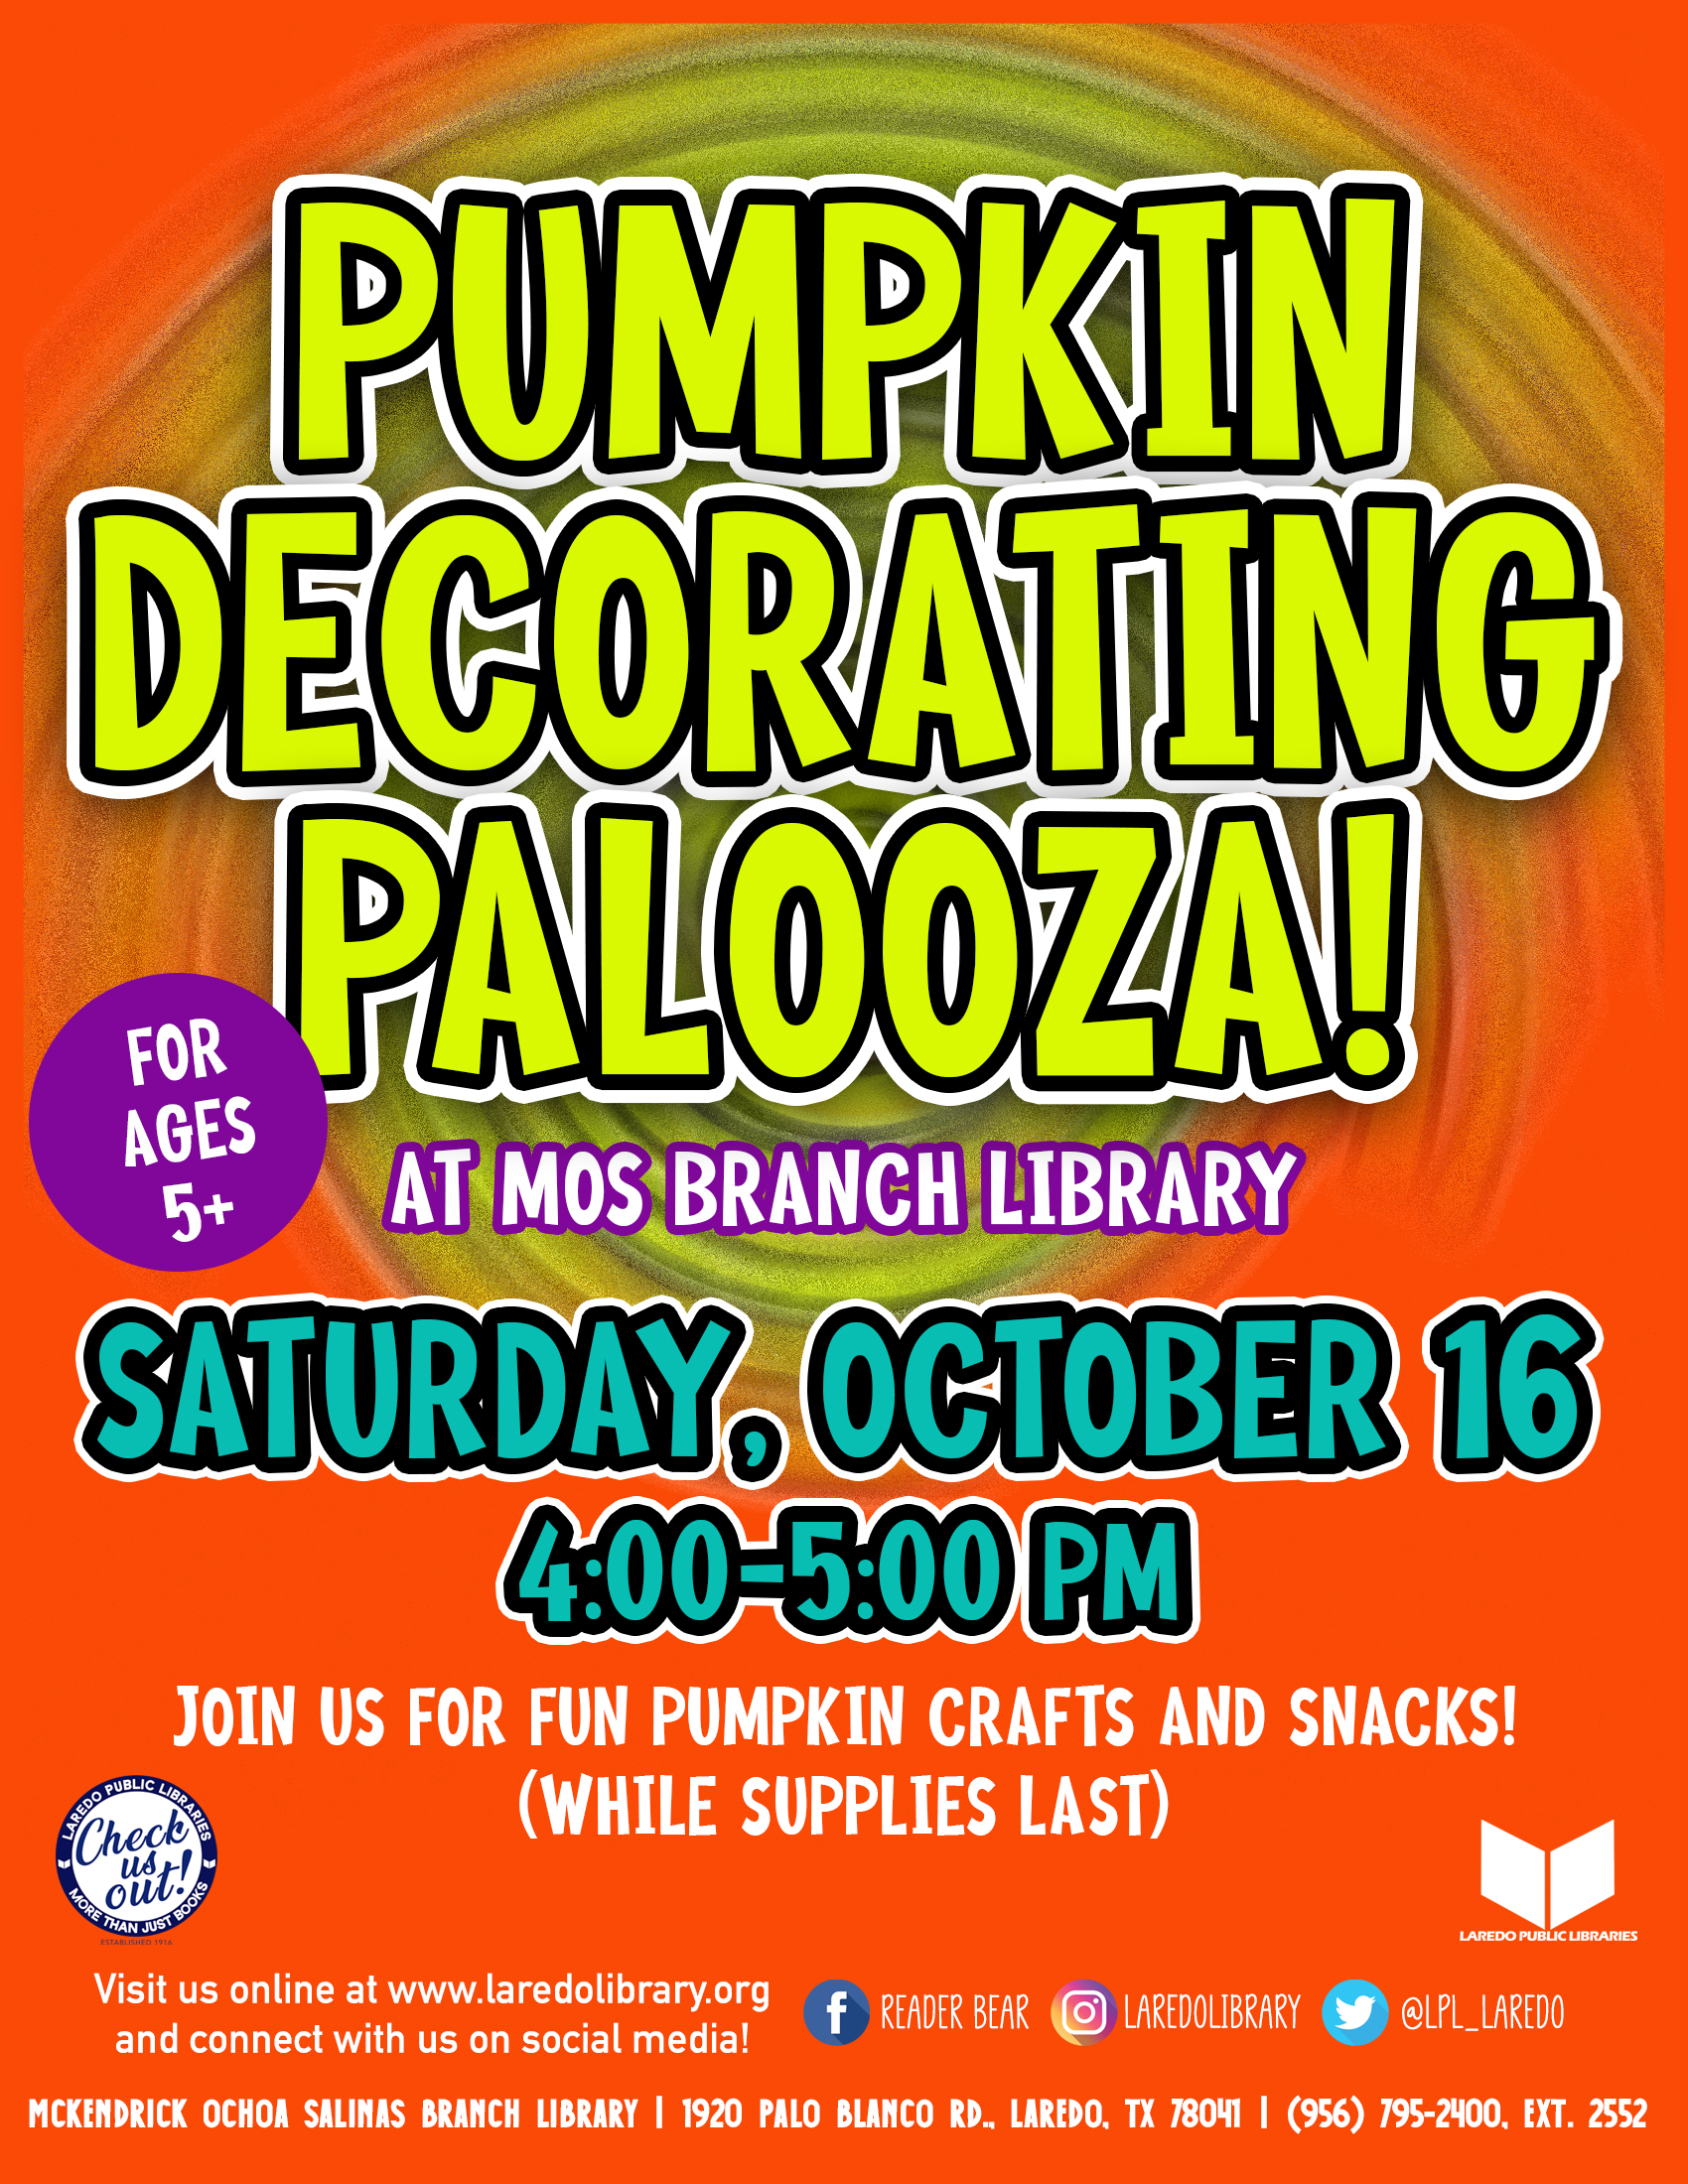 Pumpkin Decorating Palooza!